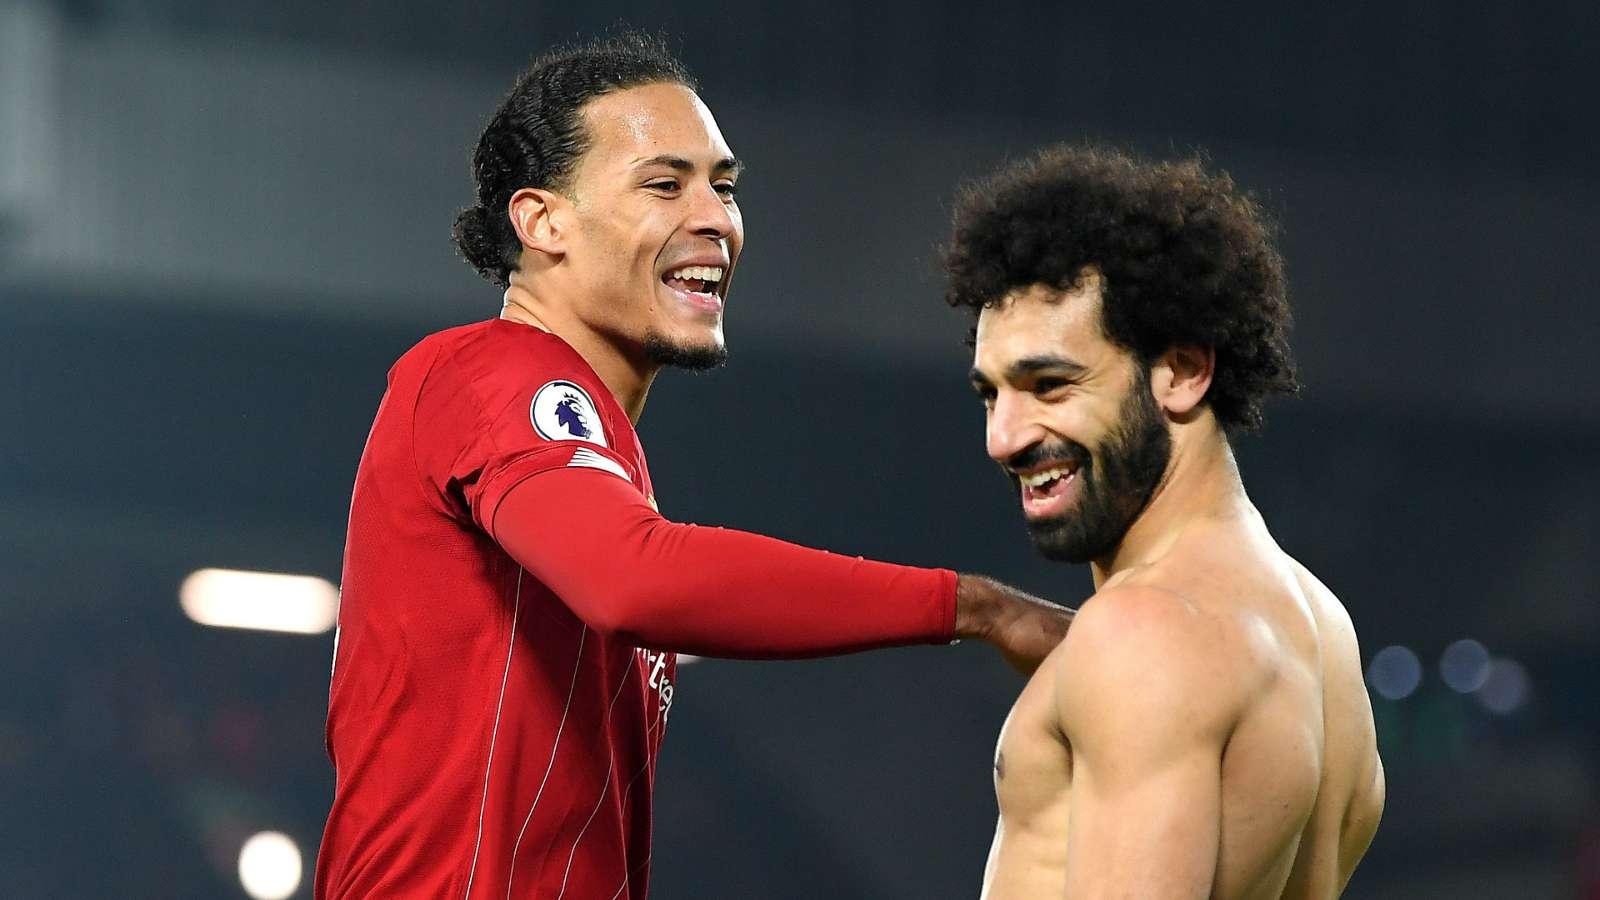 Virgil van Dijk Mohamed Salah Liverpool 2019-20